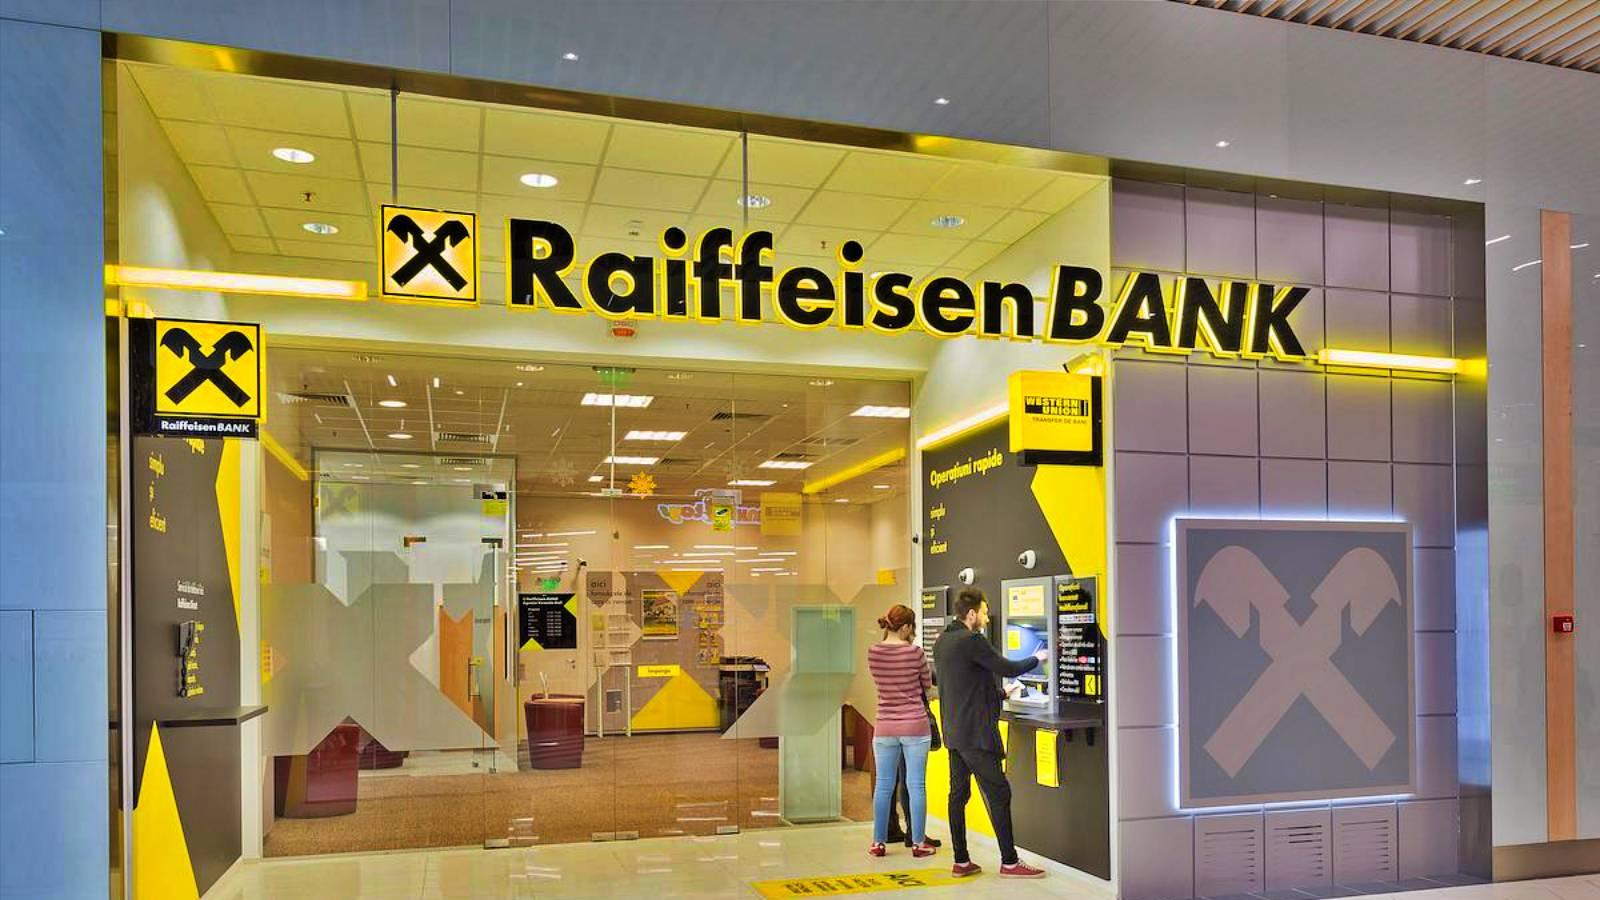 Raiffeisen Bank planificare